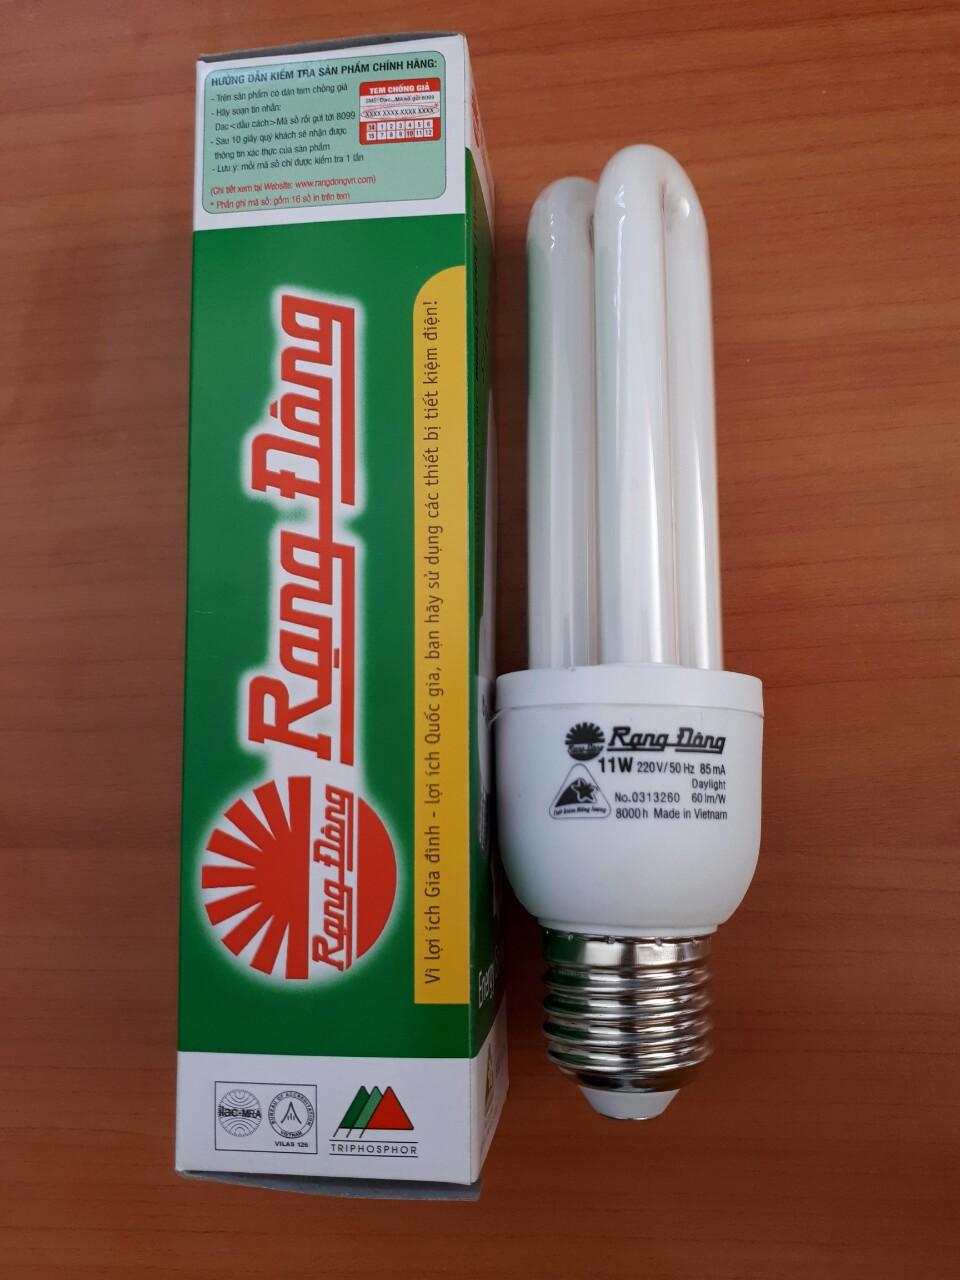 Compact CFL-2UT4-11W H8 RANGDONG